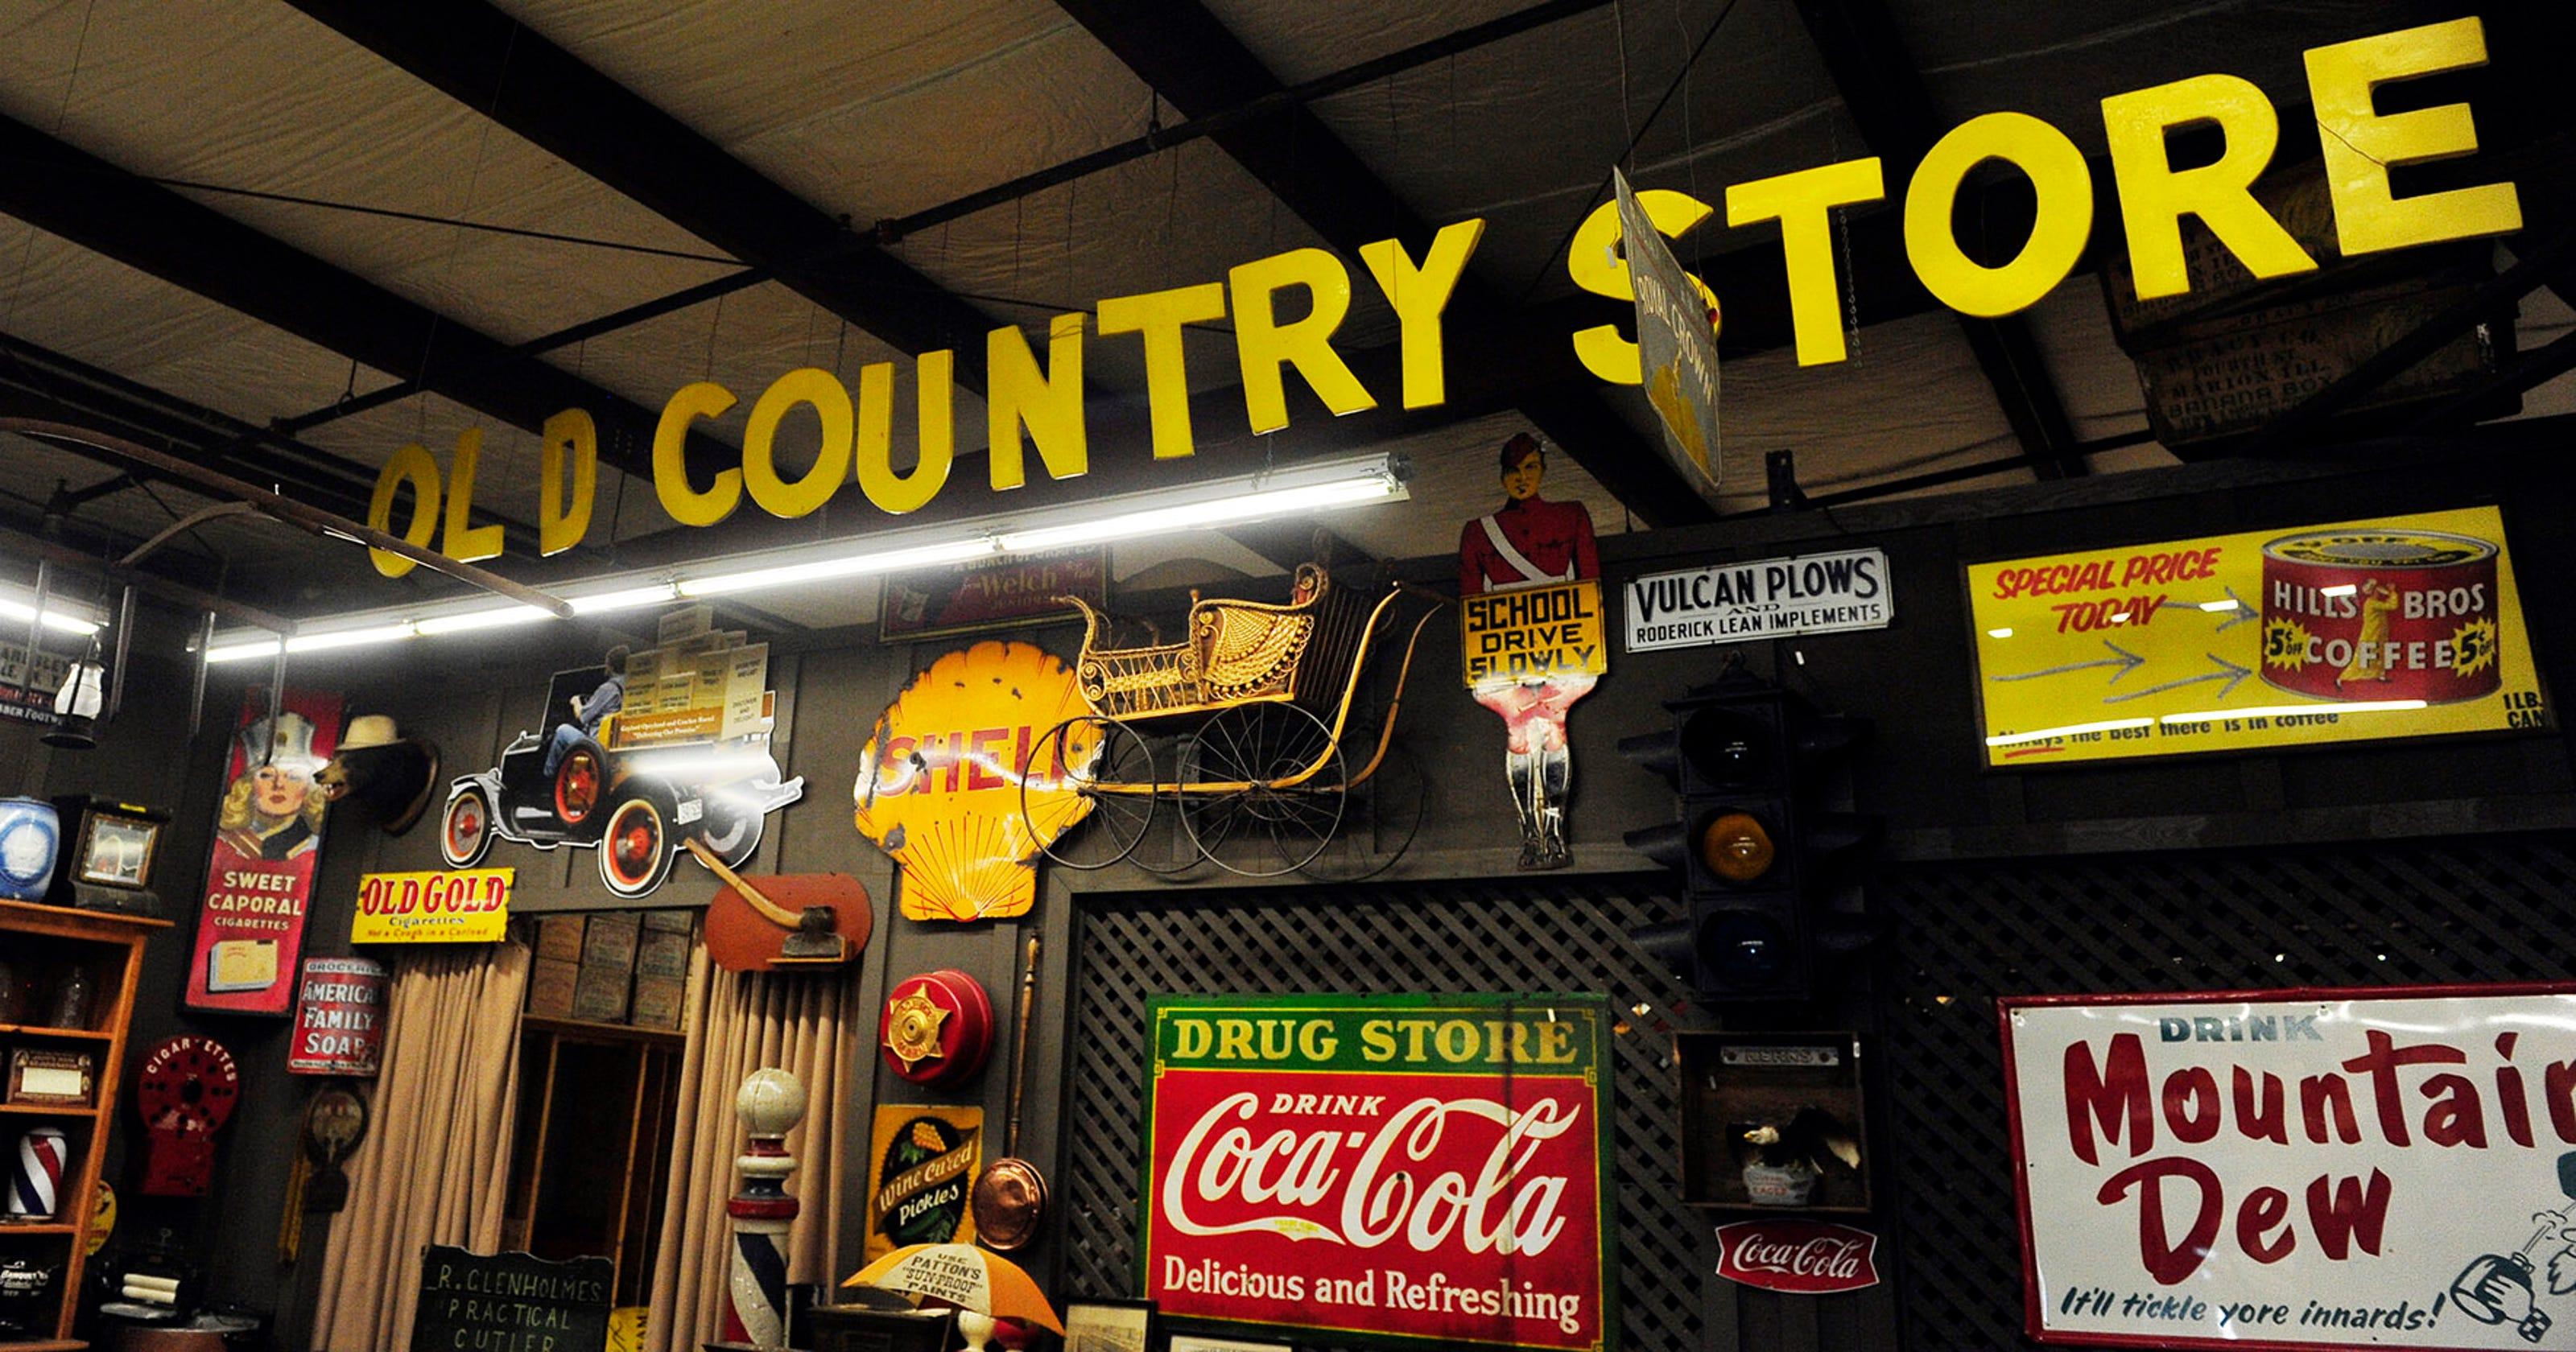 Cracker Barrel warehouse is treasure trove of Americana